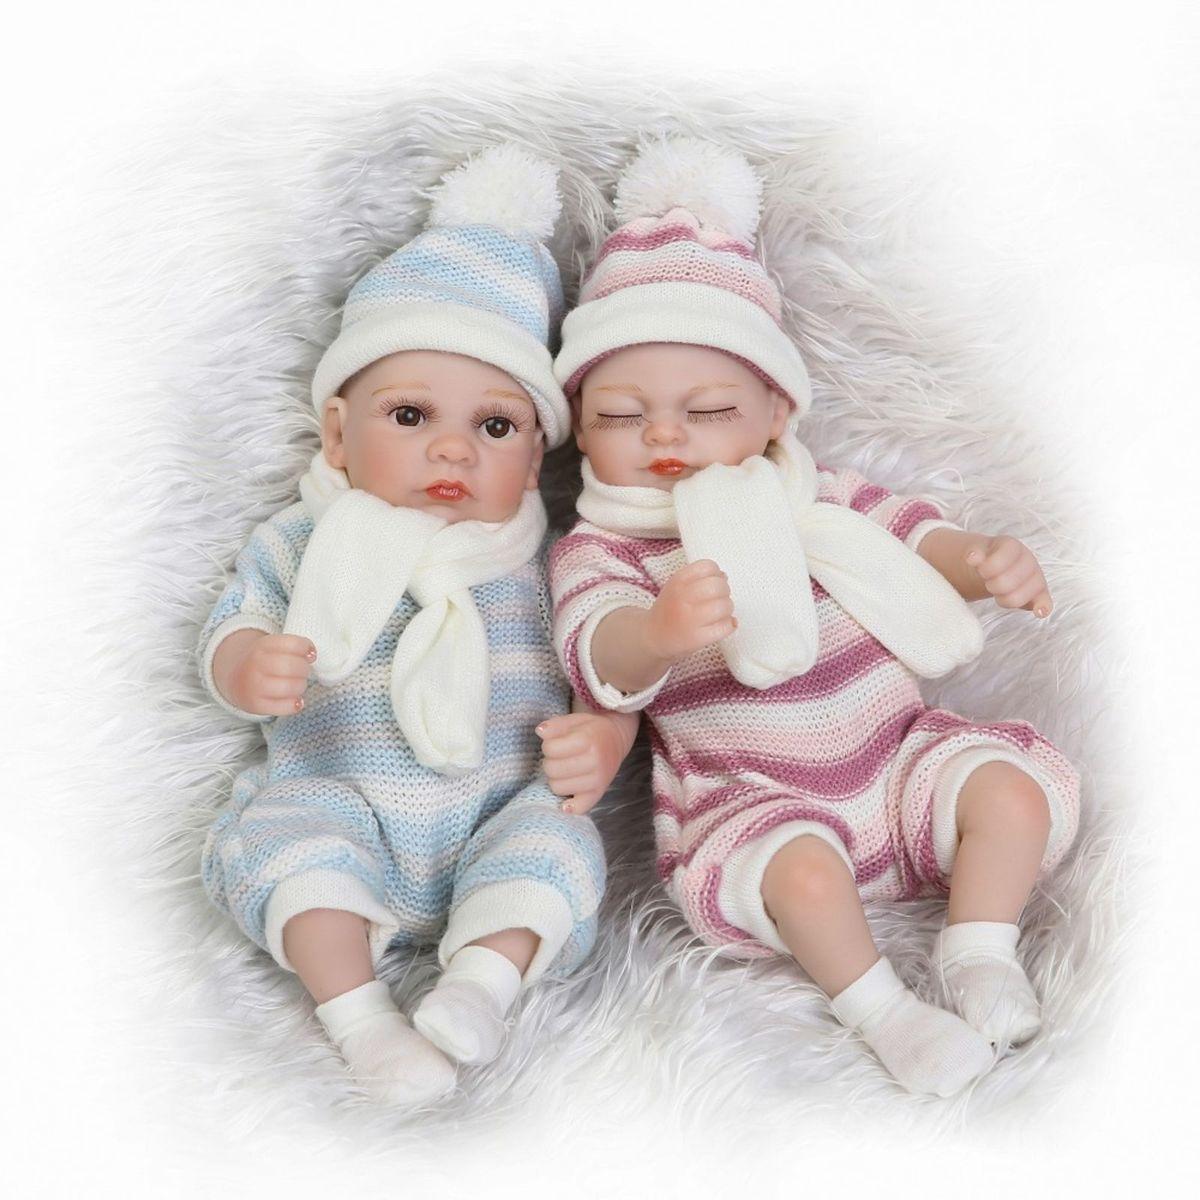 bebê reborn menino menina likelife silicone realista - crescidinhos npk  collection f1467ec993d